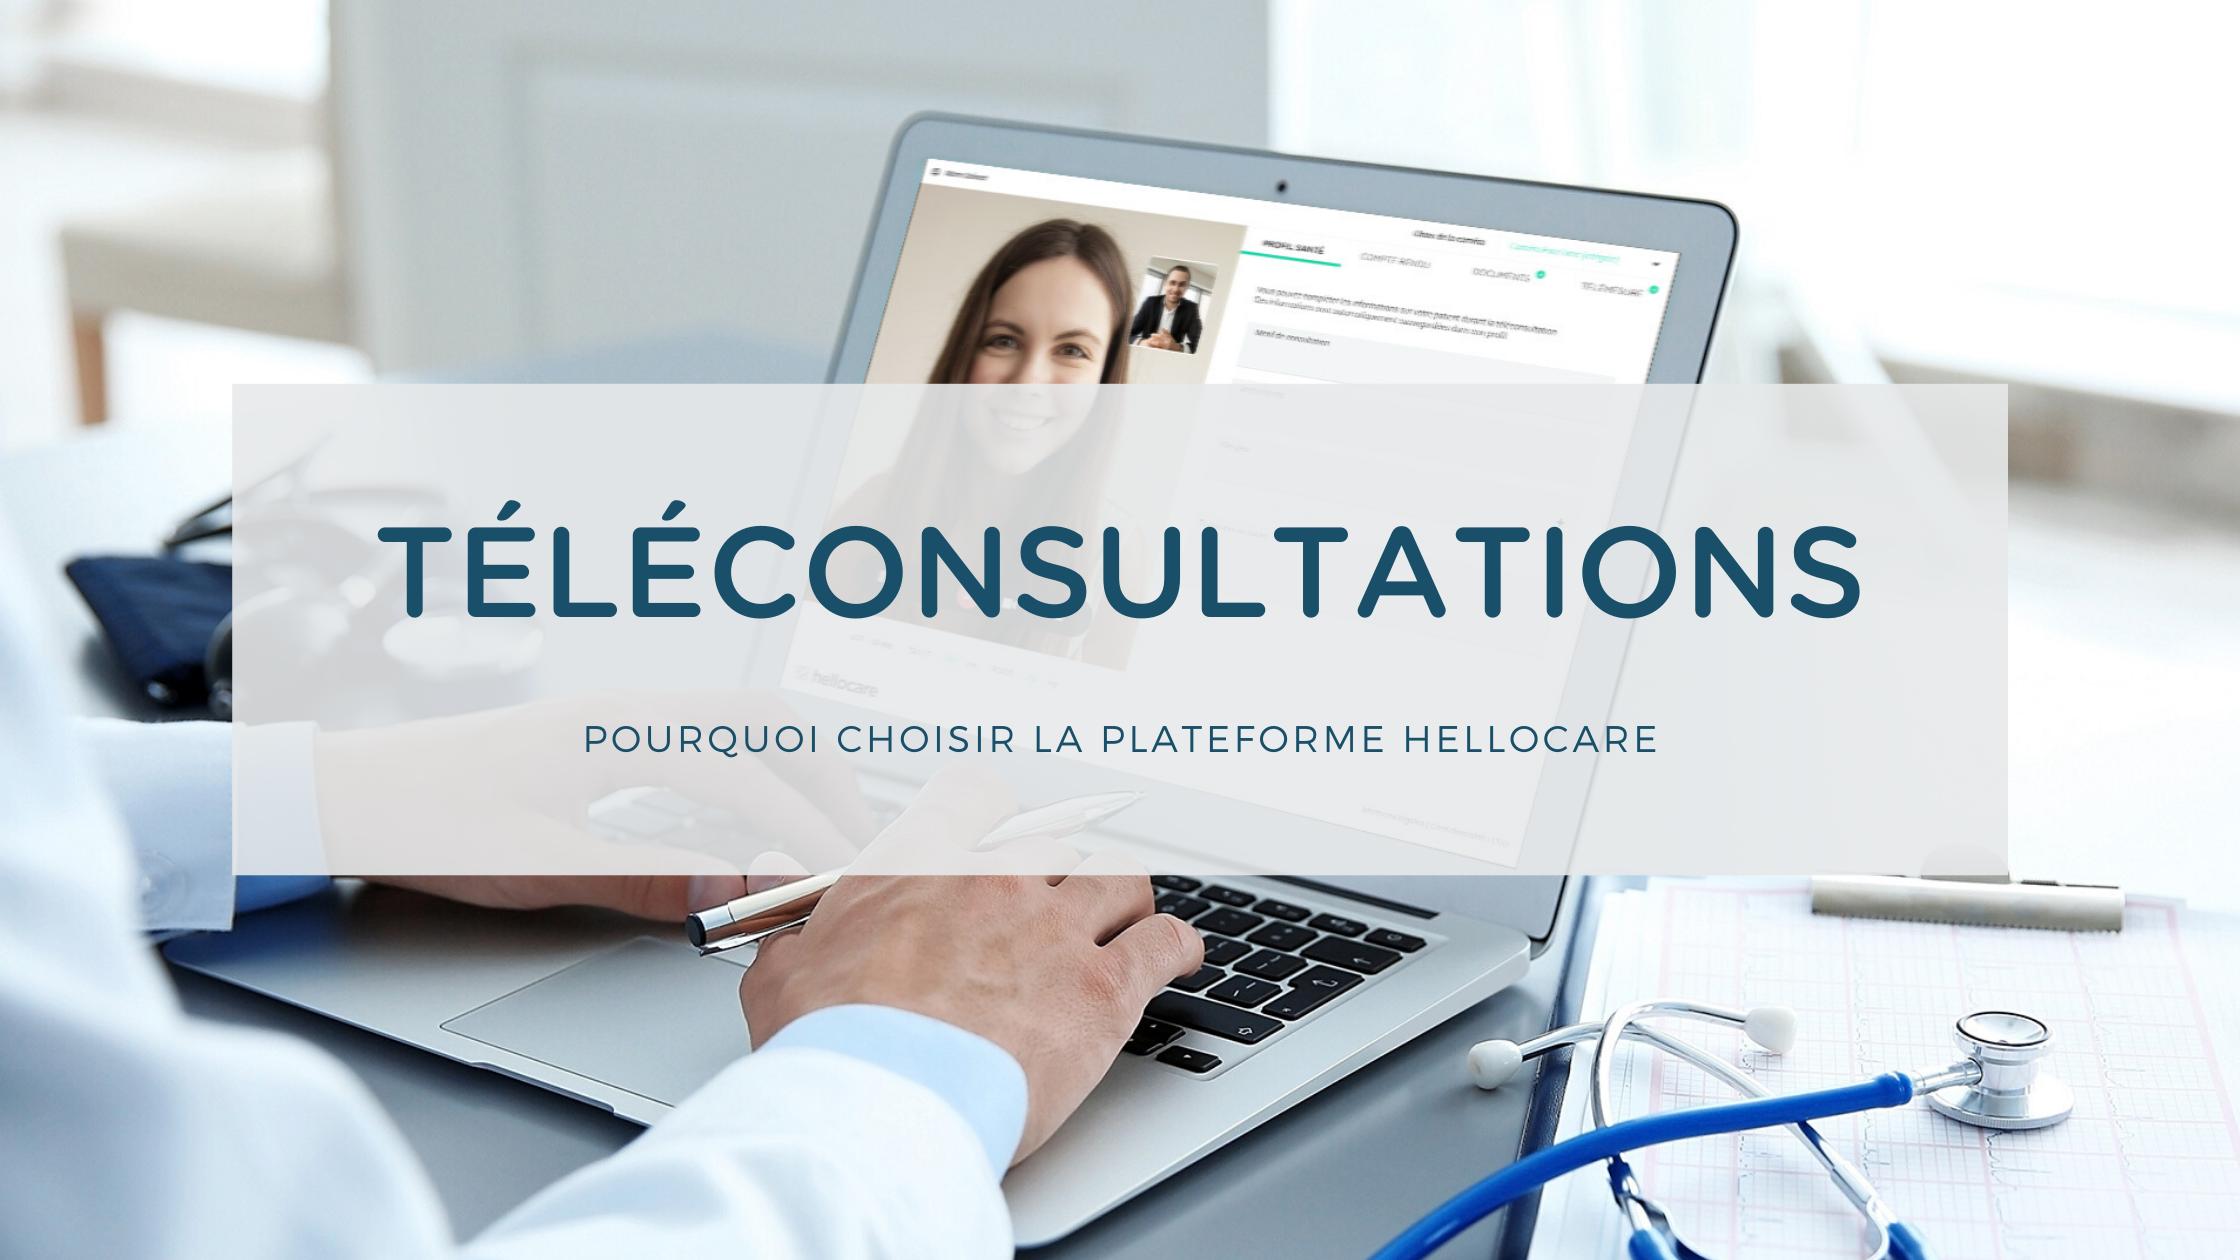 plateforme teleconsultation hellocare - Blog